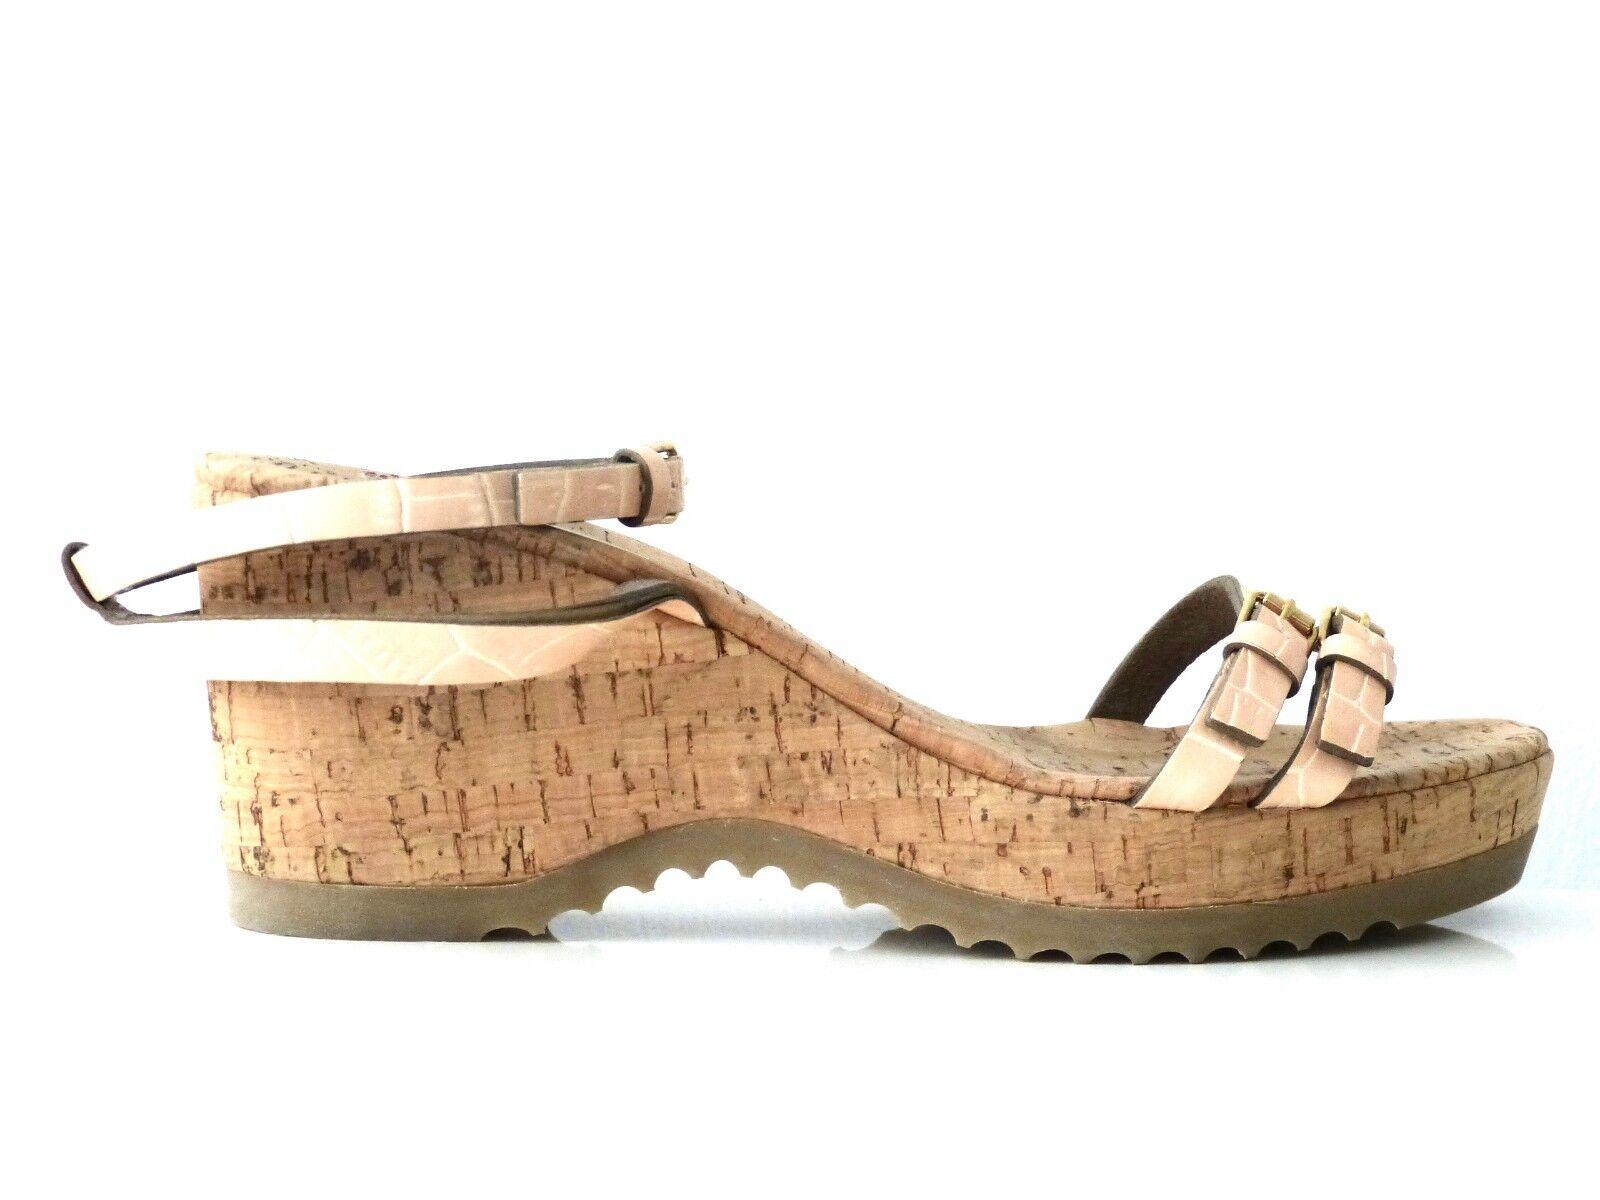 Stella McCartney Scarpe Zeppe Sandali cipria shoes Powder eu:40 NUOVO/NEW!